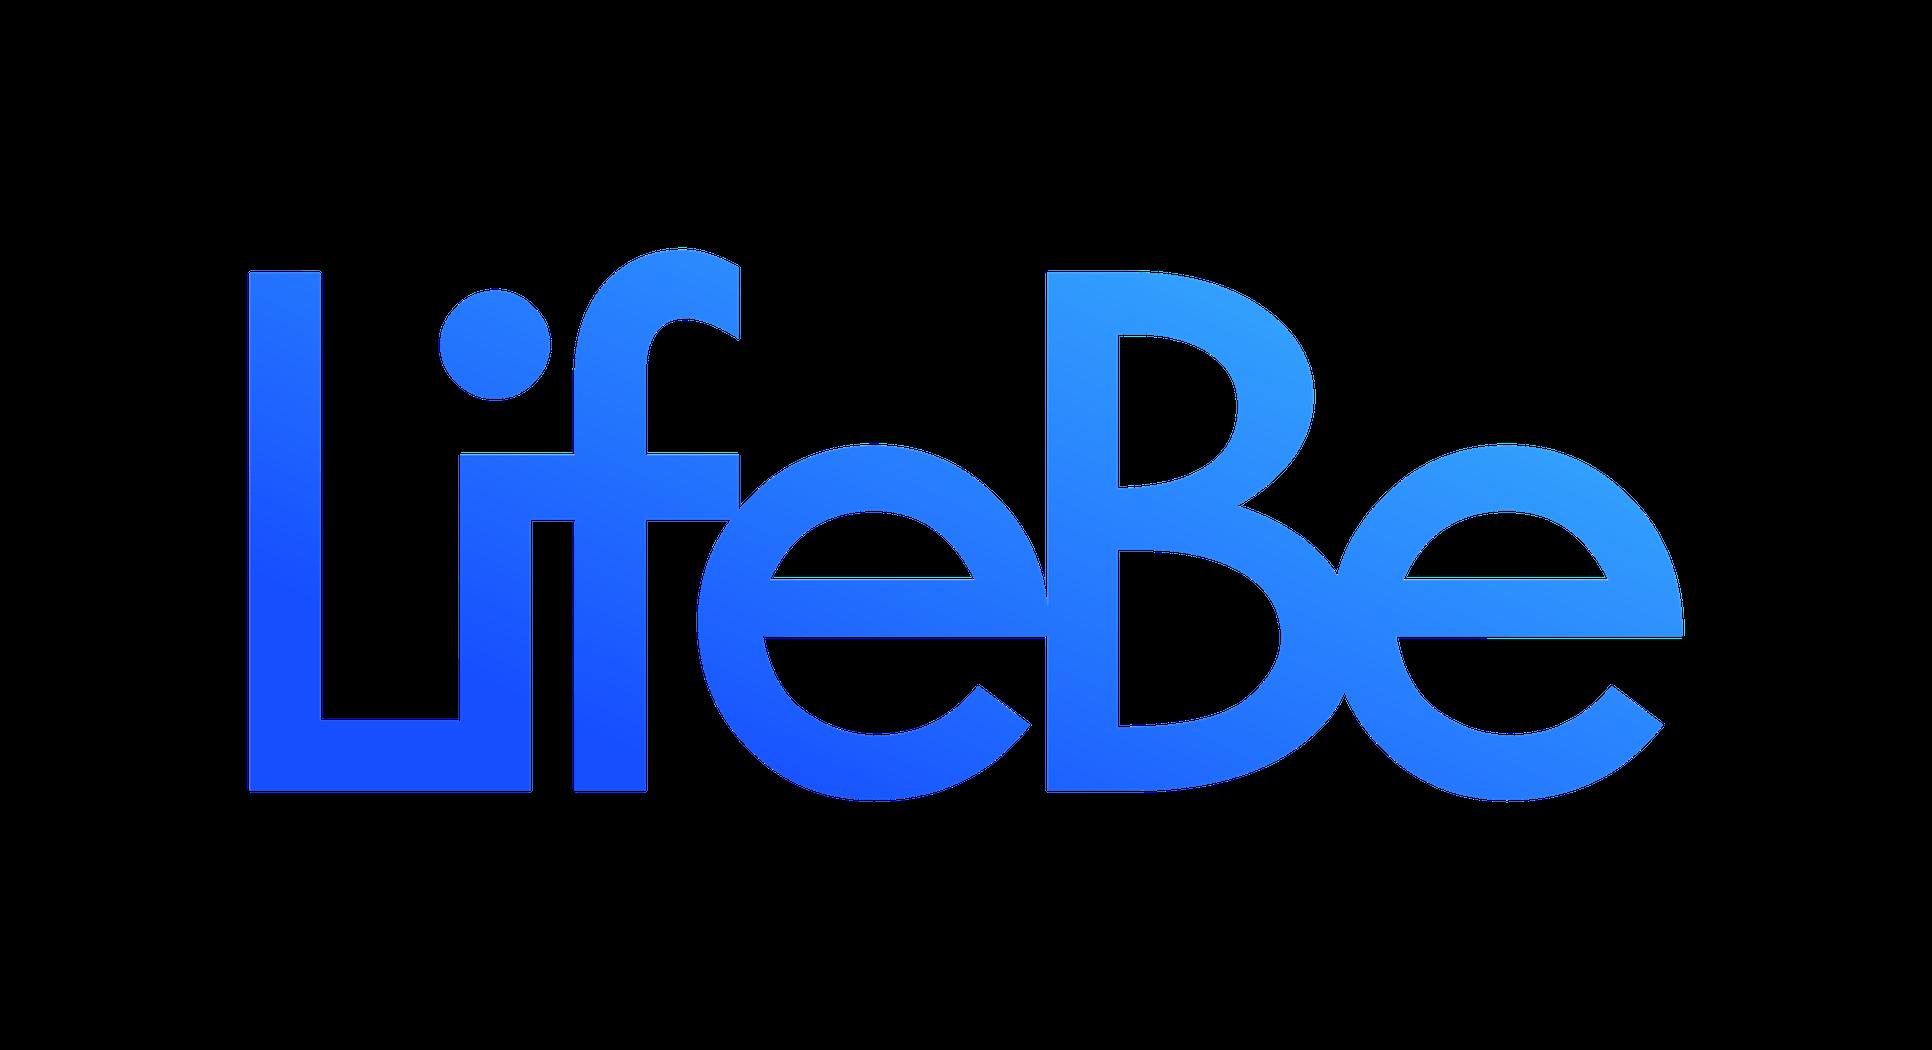 LifeBe logo